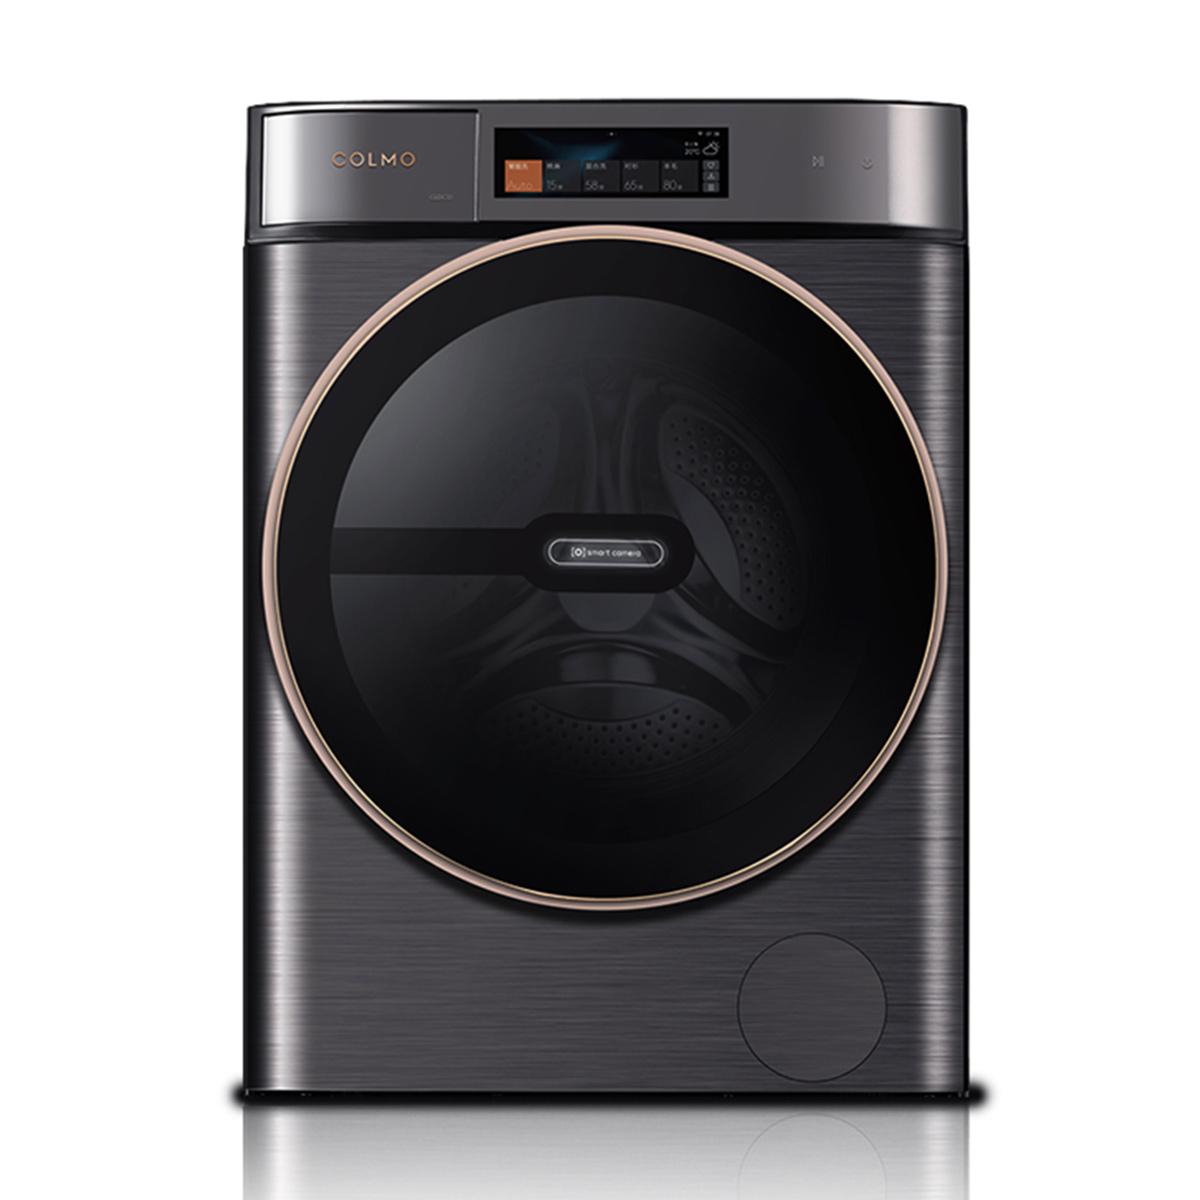 COLMO CLDC10洗衣机 说明书.pdf